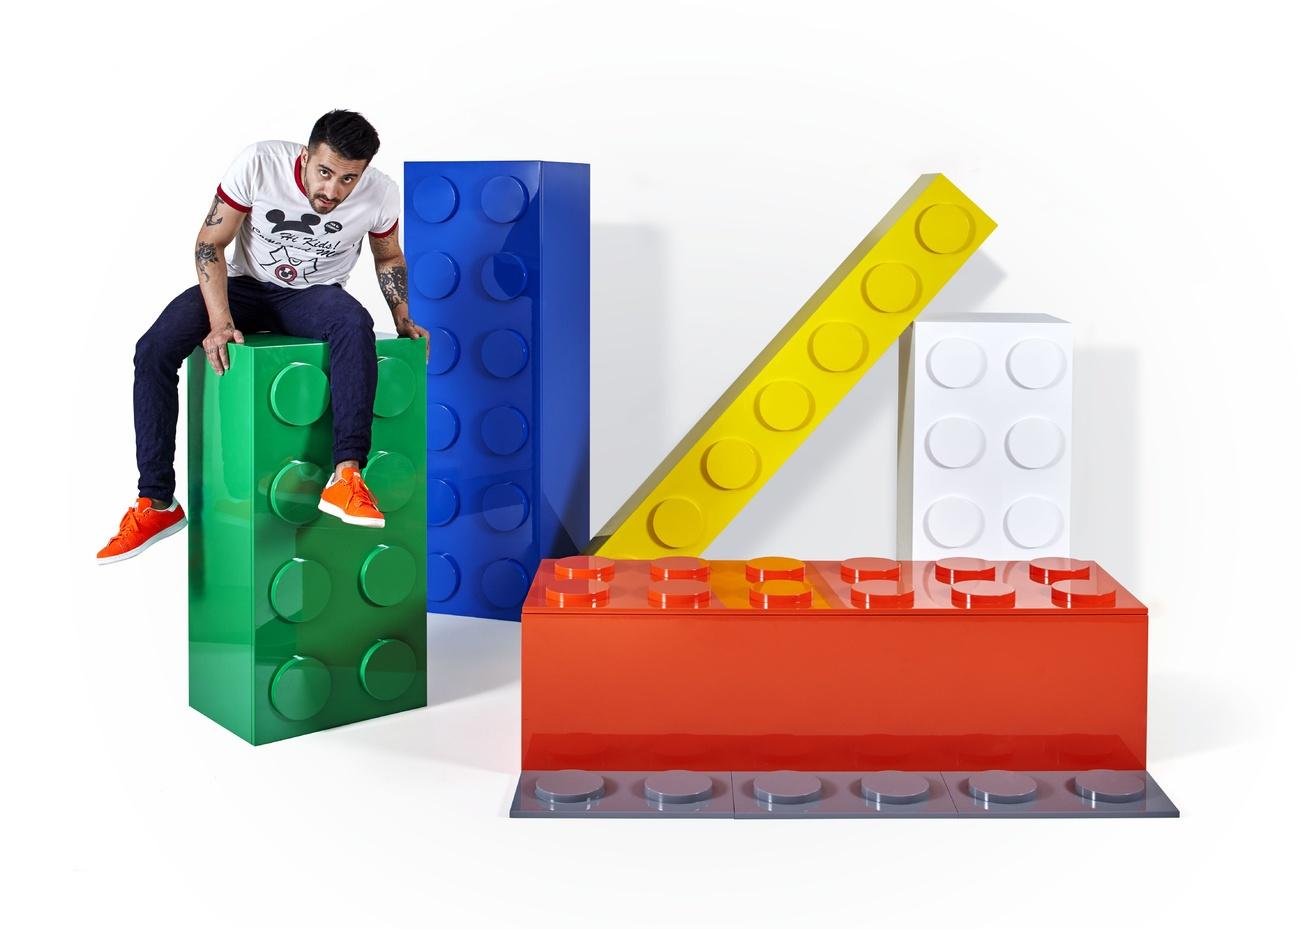 Система хранения Bricks   галерея [1] фото [3]